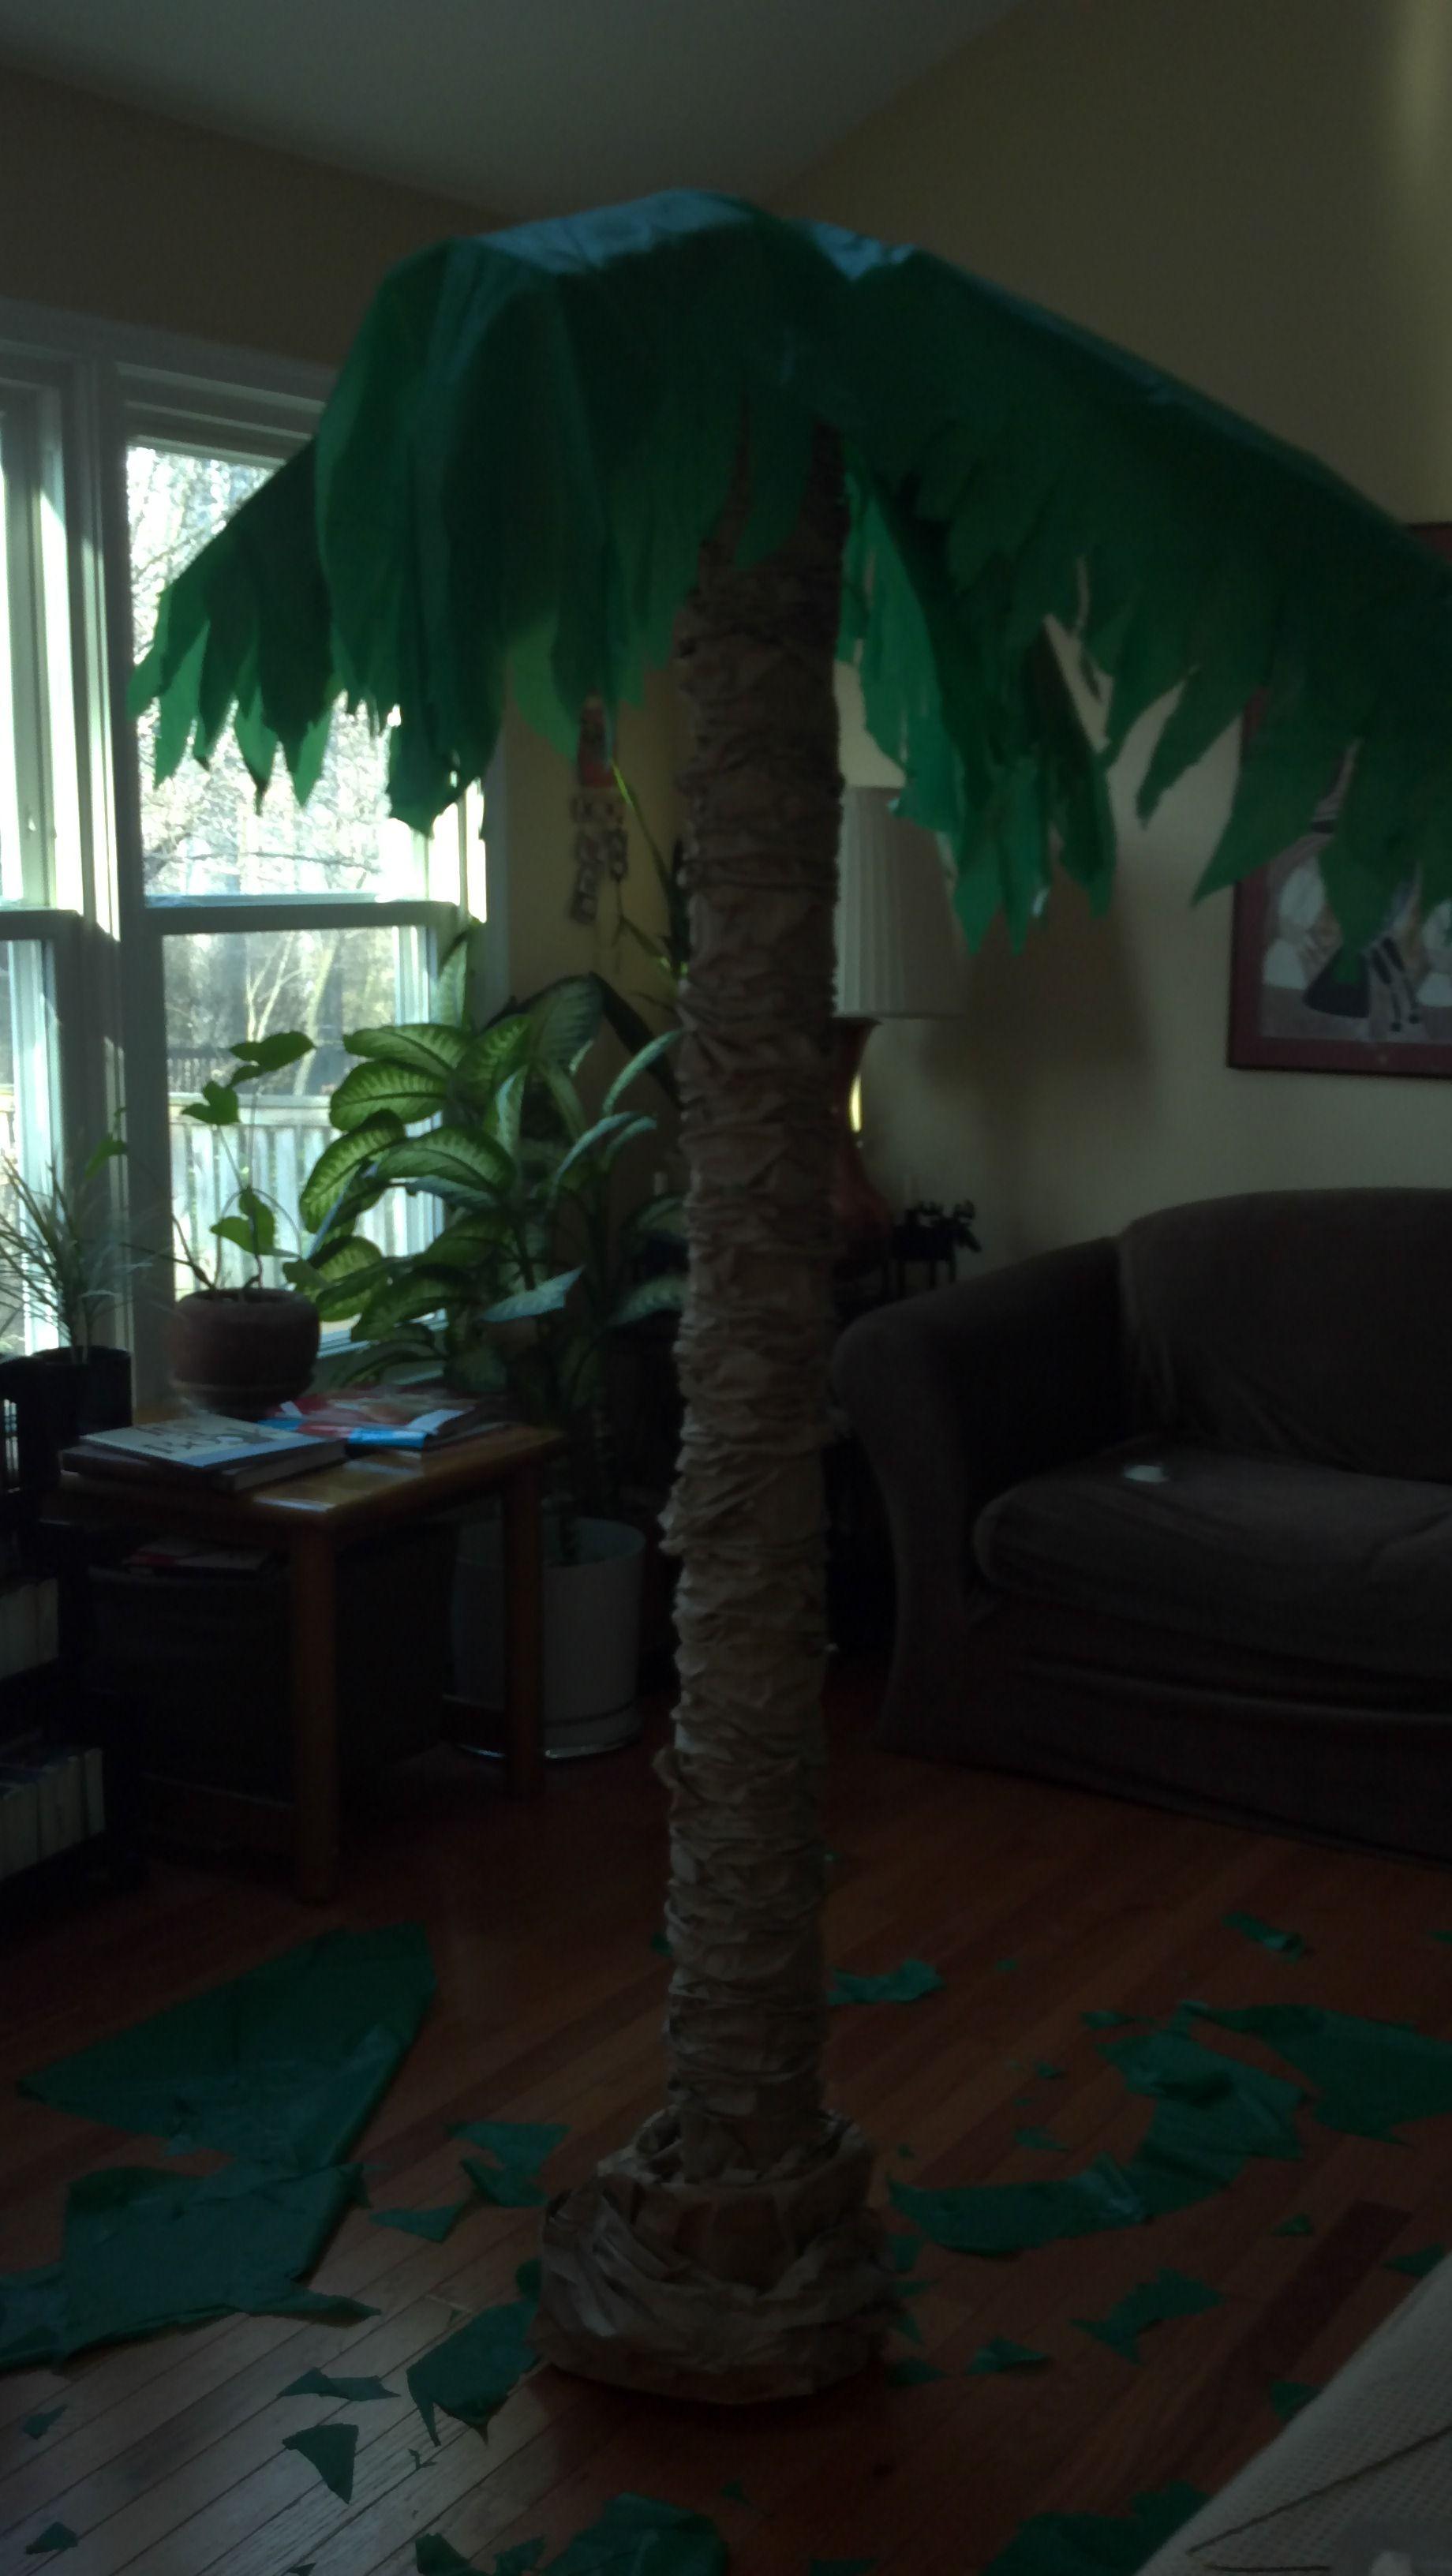 DIY Palm Tree. Circular Plastic Tablecloths Over Hanger U0026 Cardboard Frond  Frame, Trunk Cardboard